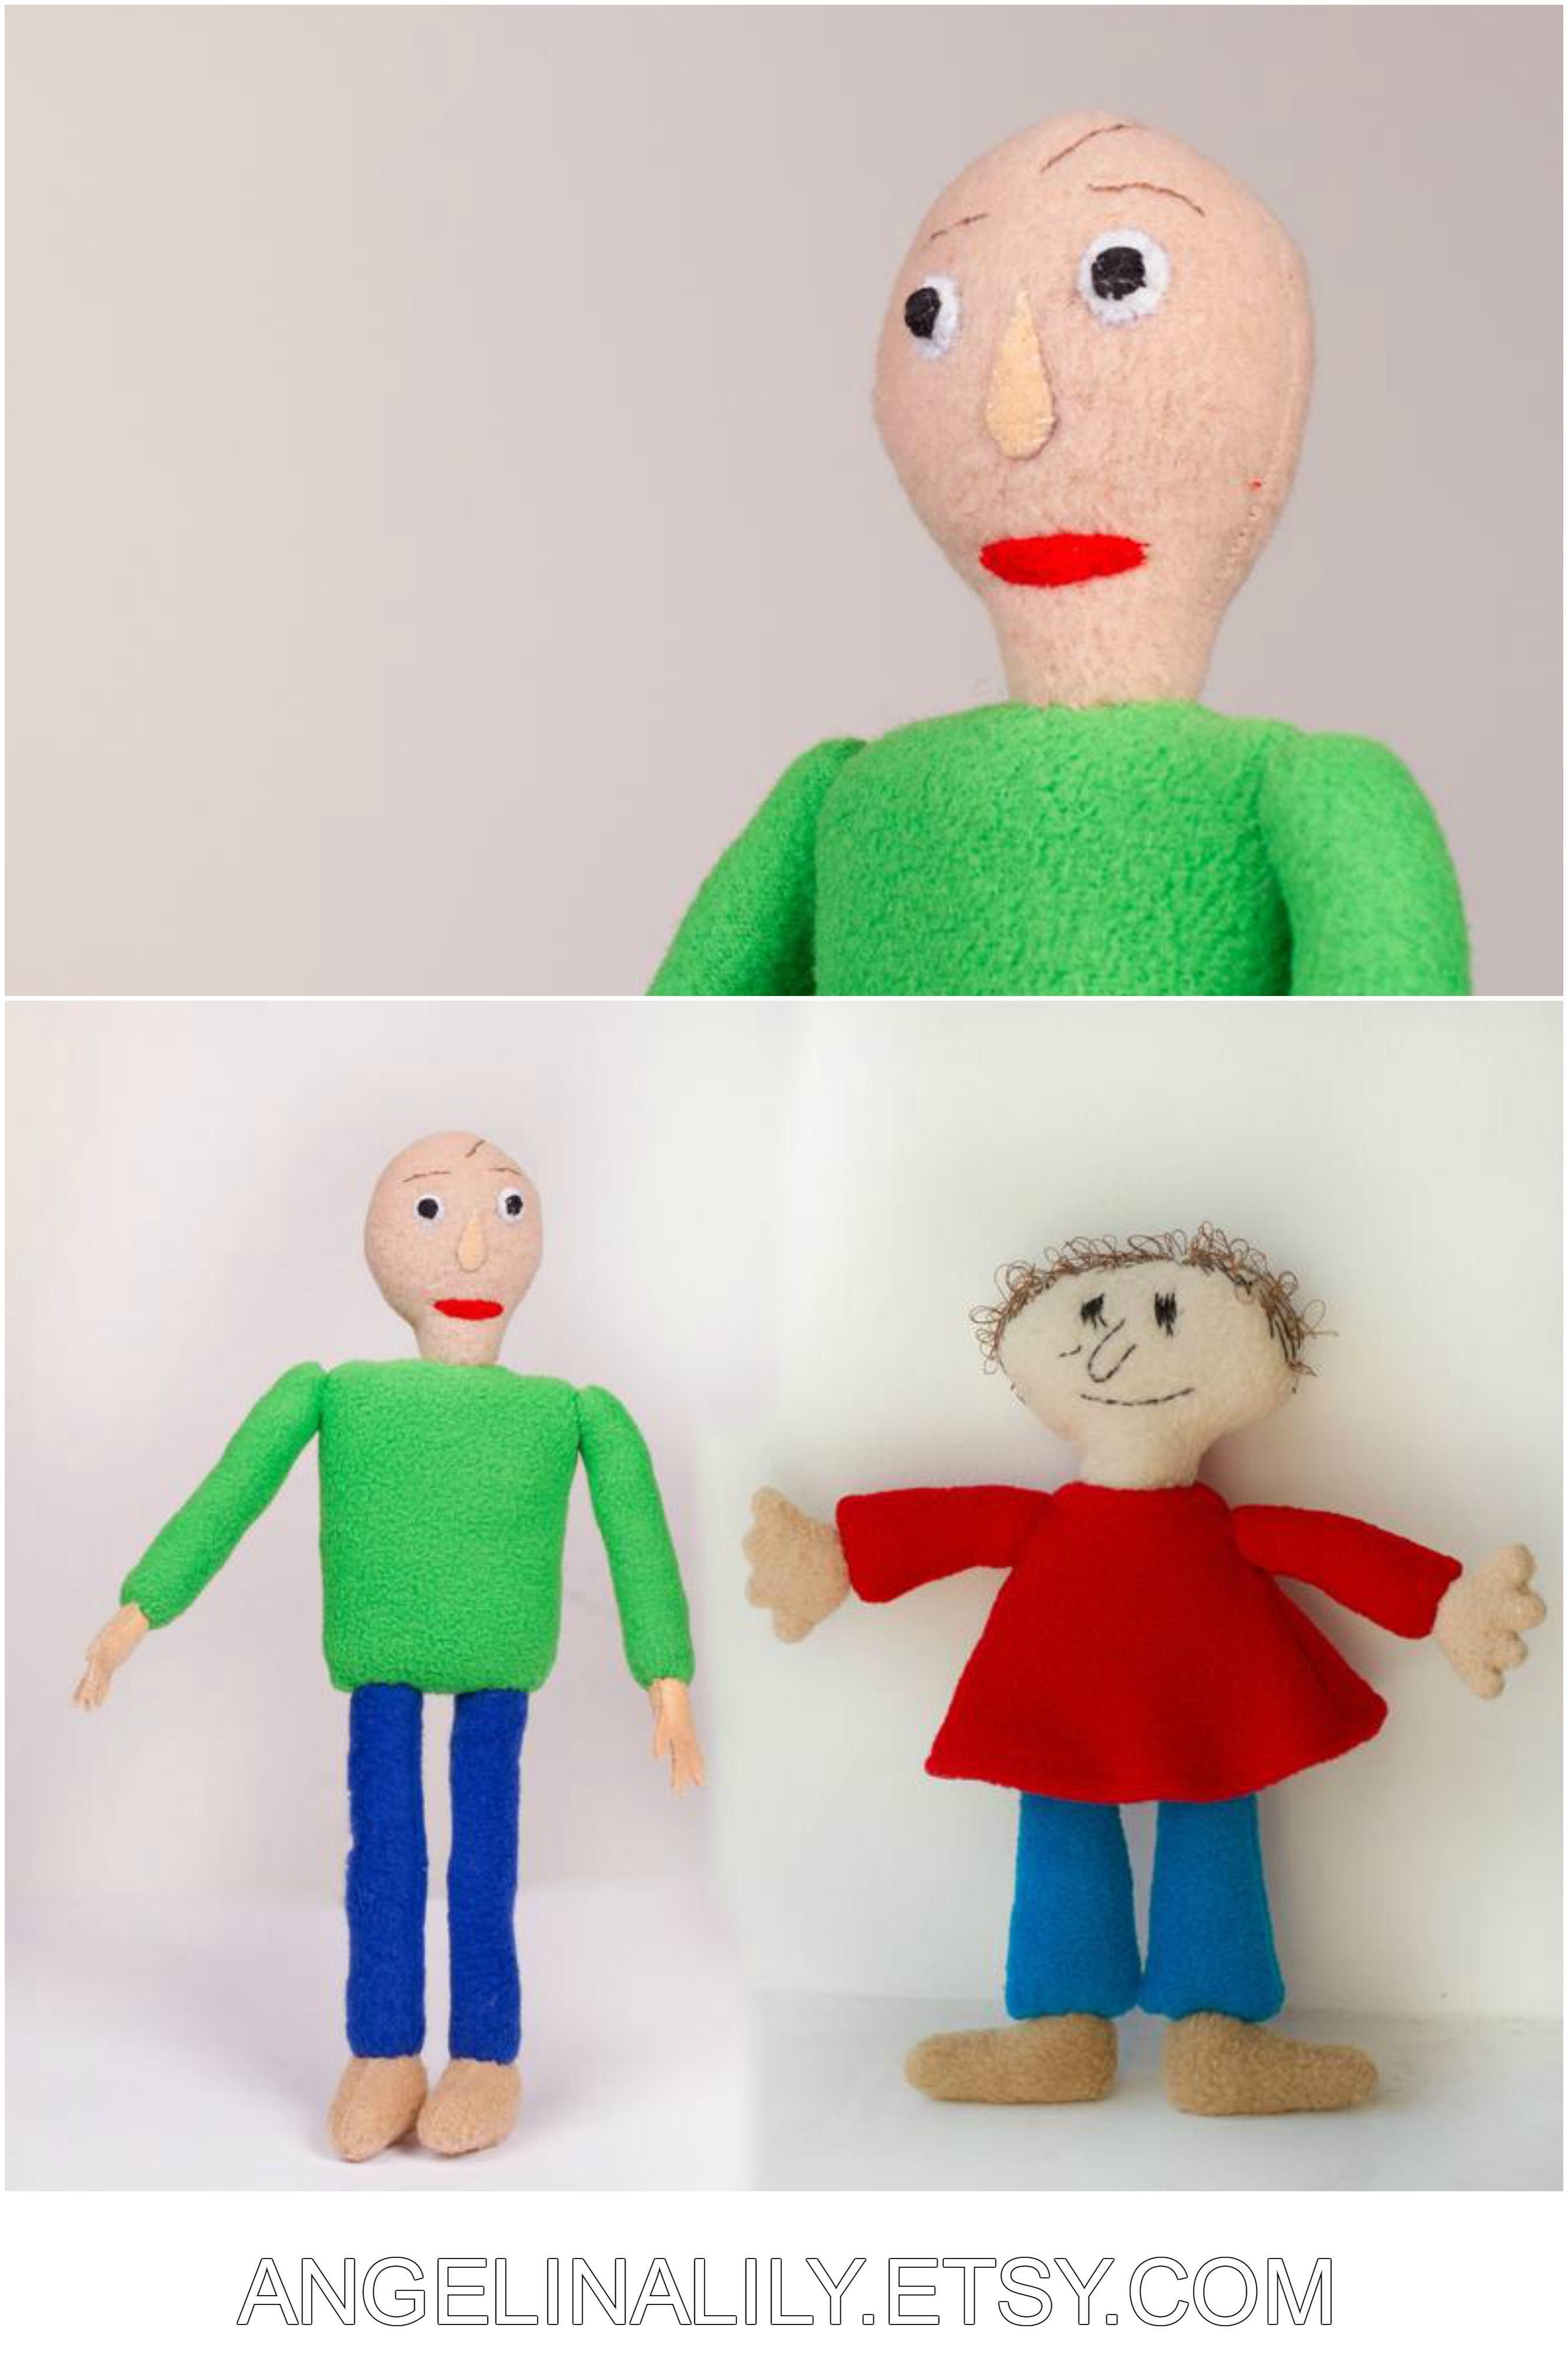 Baldi S Plush Baldi S Basics In Education And Learning Inspired Plush Handmade Soft Toy Two Sizes